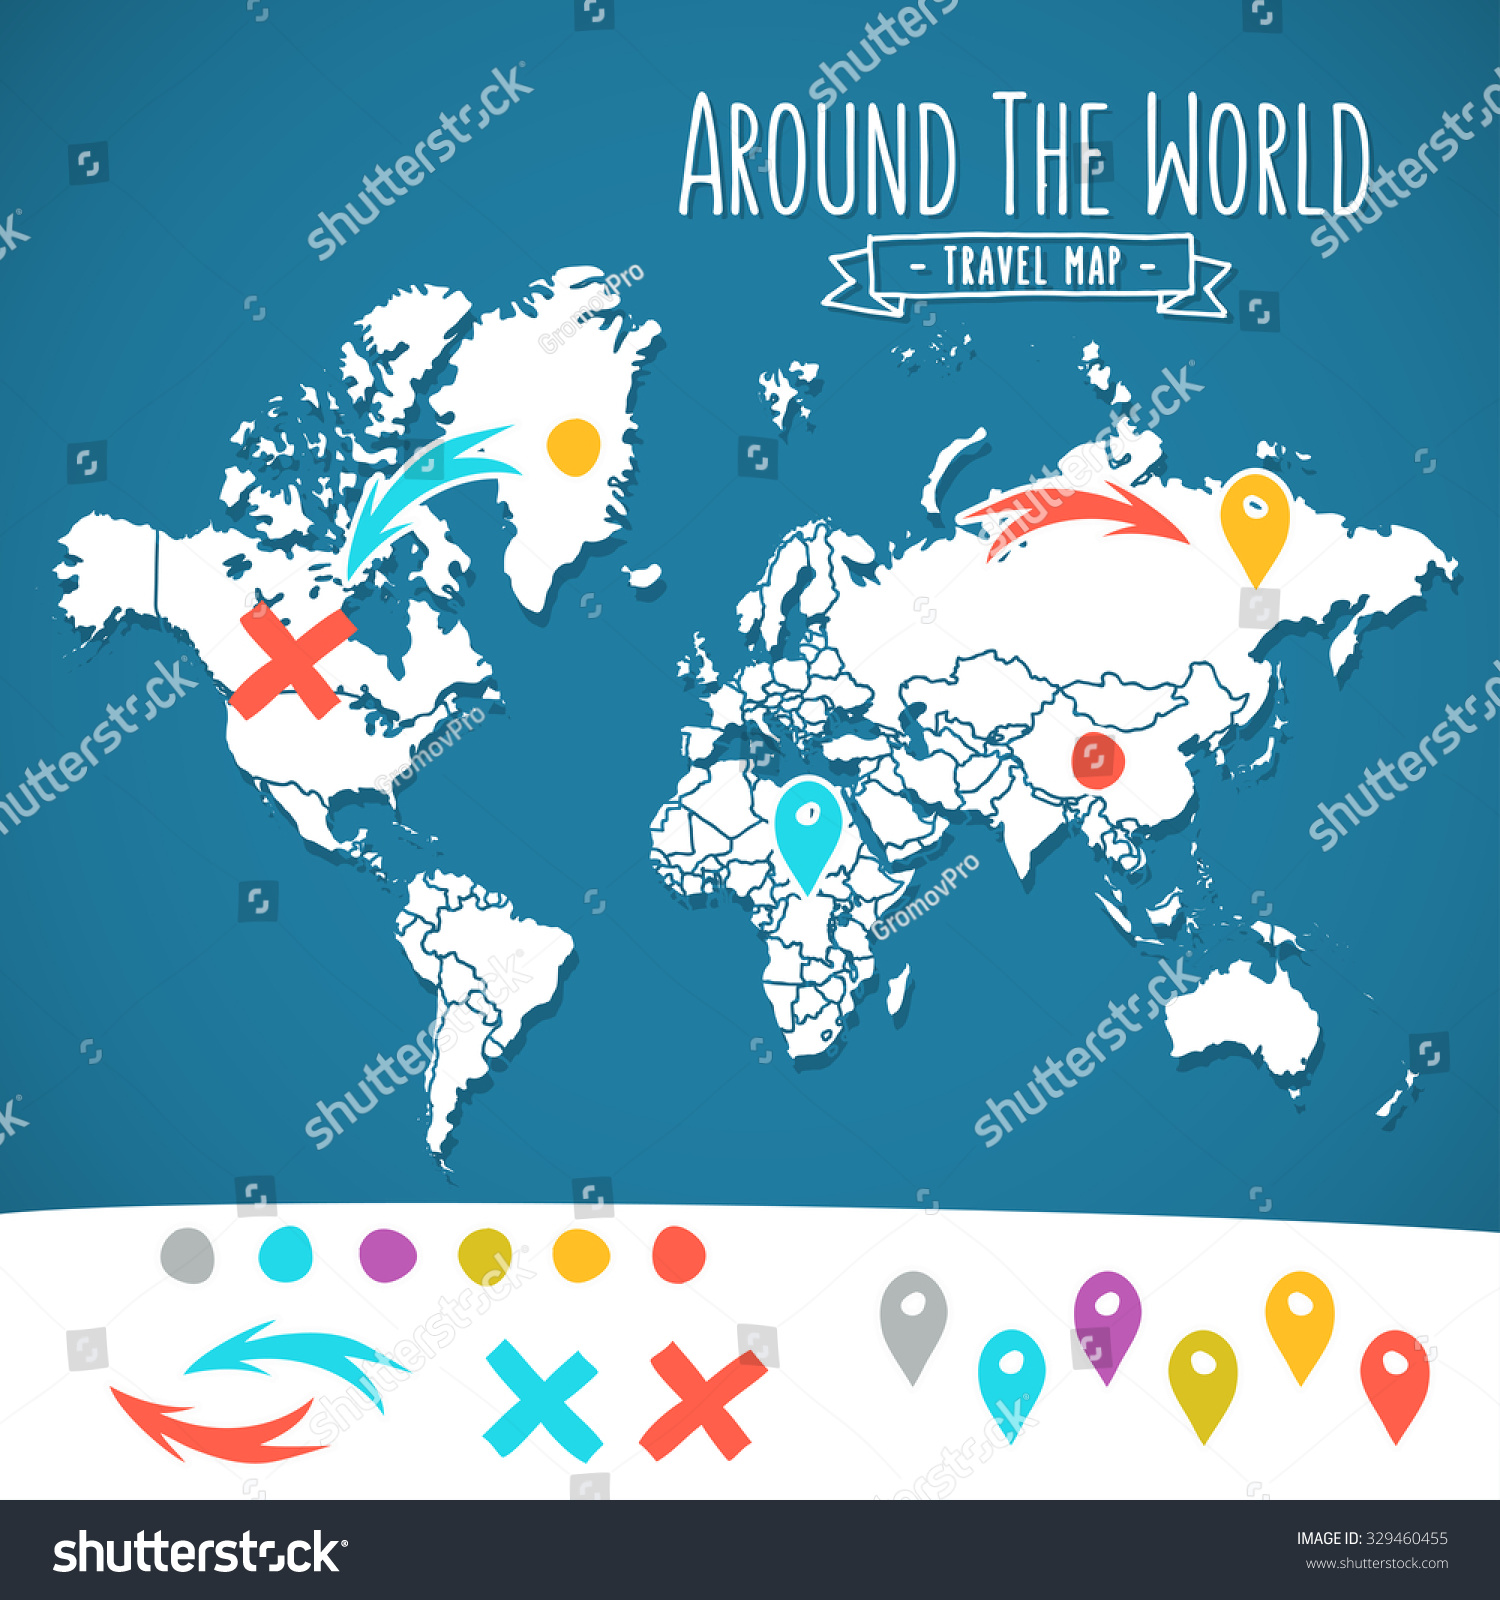 Hand drawn world map pins arrows stock vector 329460455 shutterstock hand drawn world map with pins and arrows vector design cartoon style atlas illustration sciox Choice Image